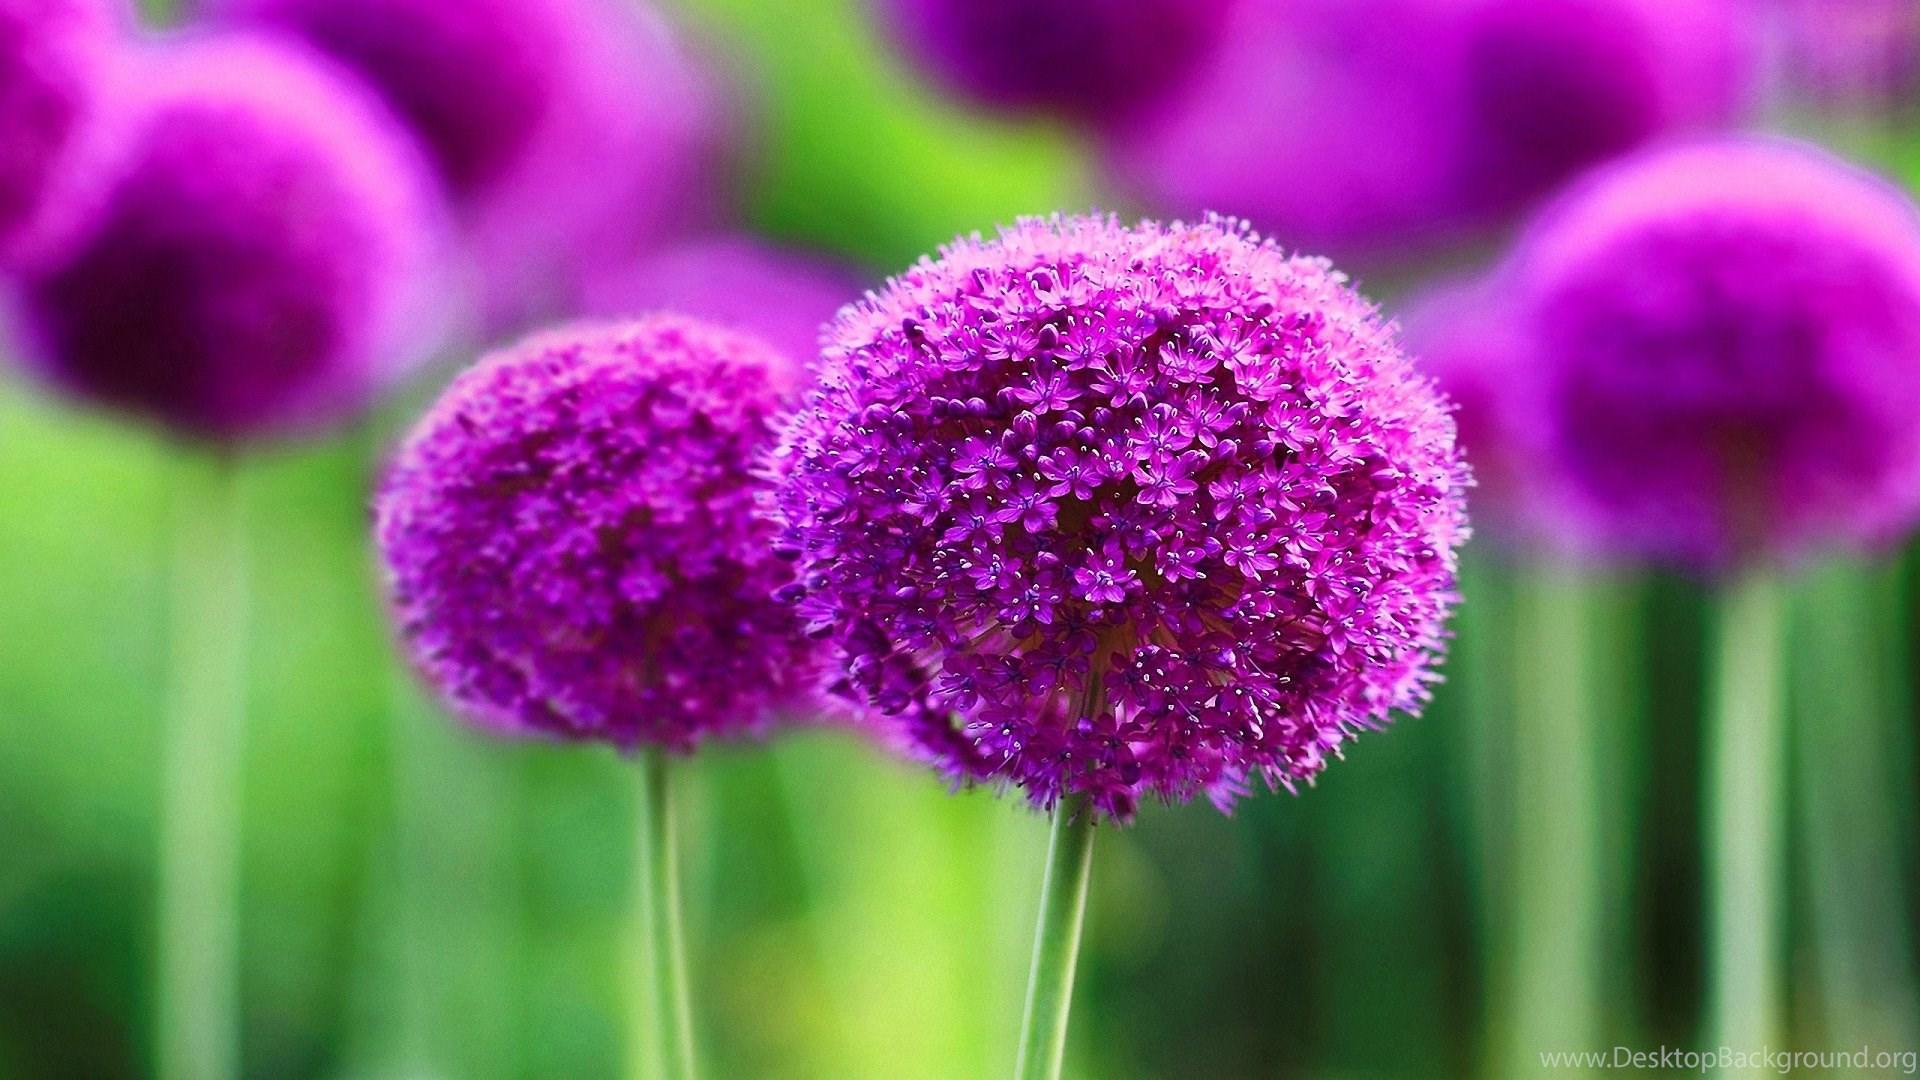 Good Wallpaper High Quality Purple - 788859_flower-wallpaper-beautiful-purple-flower-wallpapers-high-quality_1920x1080_h  Best Photo Reference_773778.jpg